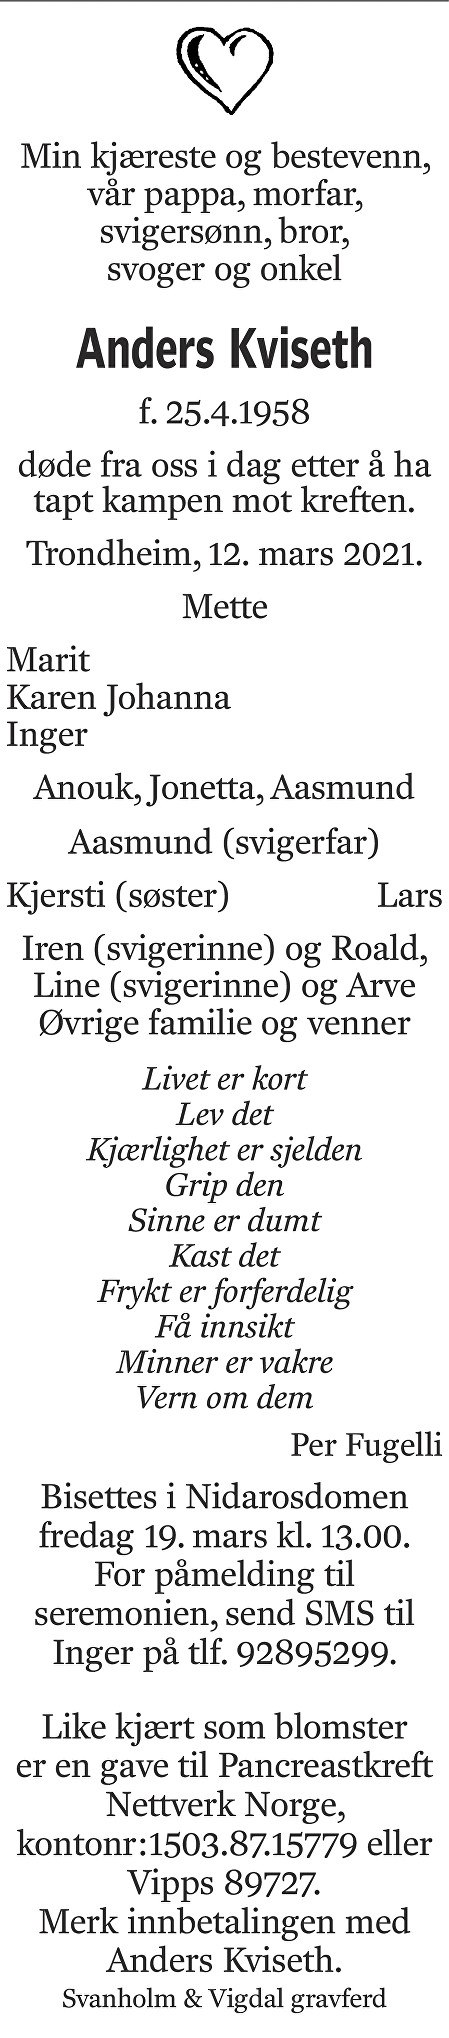 Anders Kviseth Dødsannonse